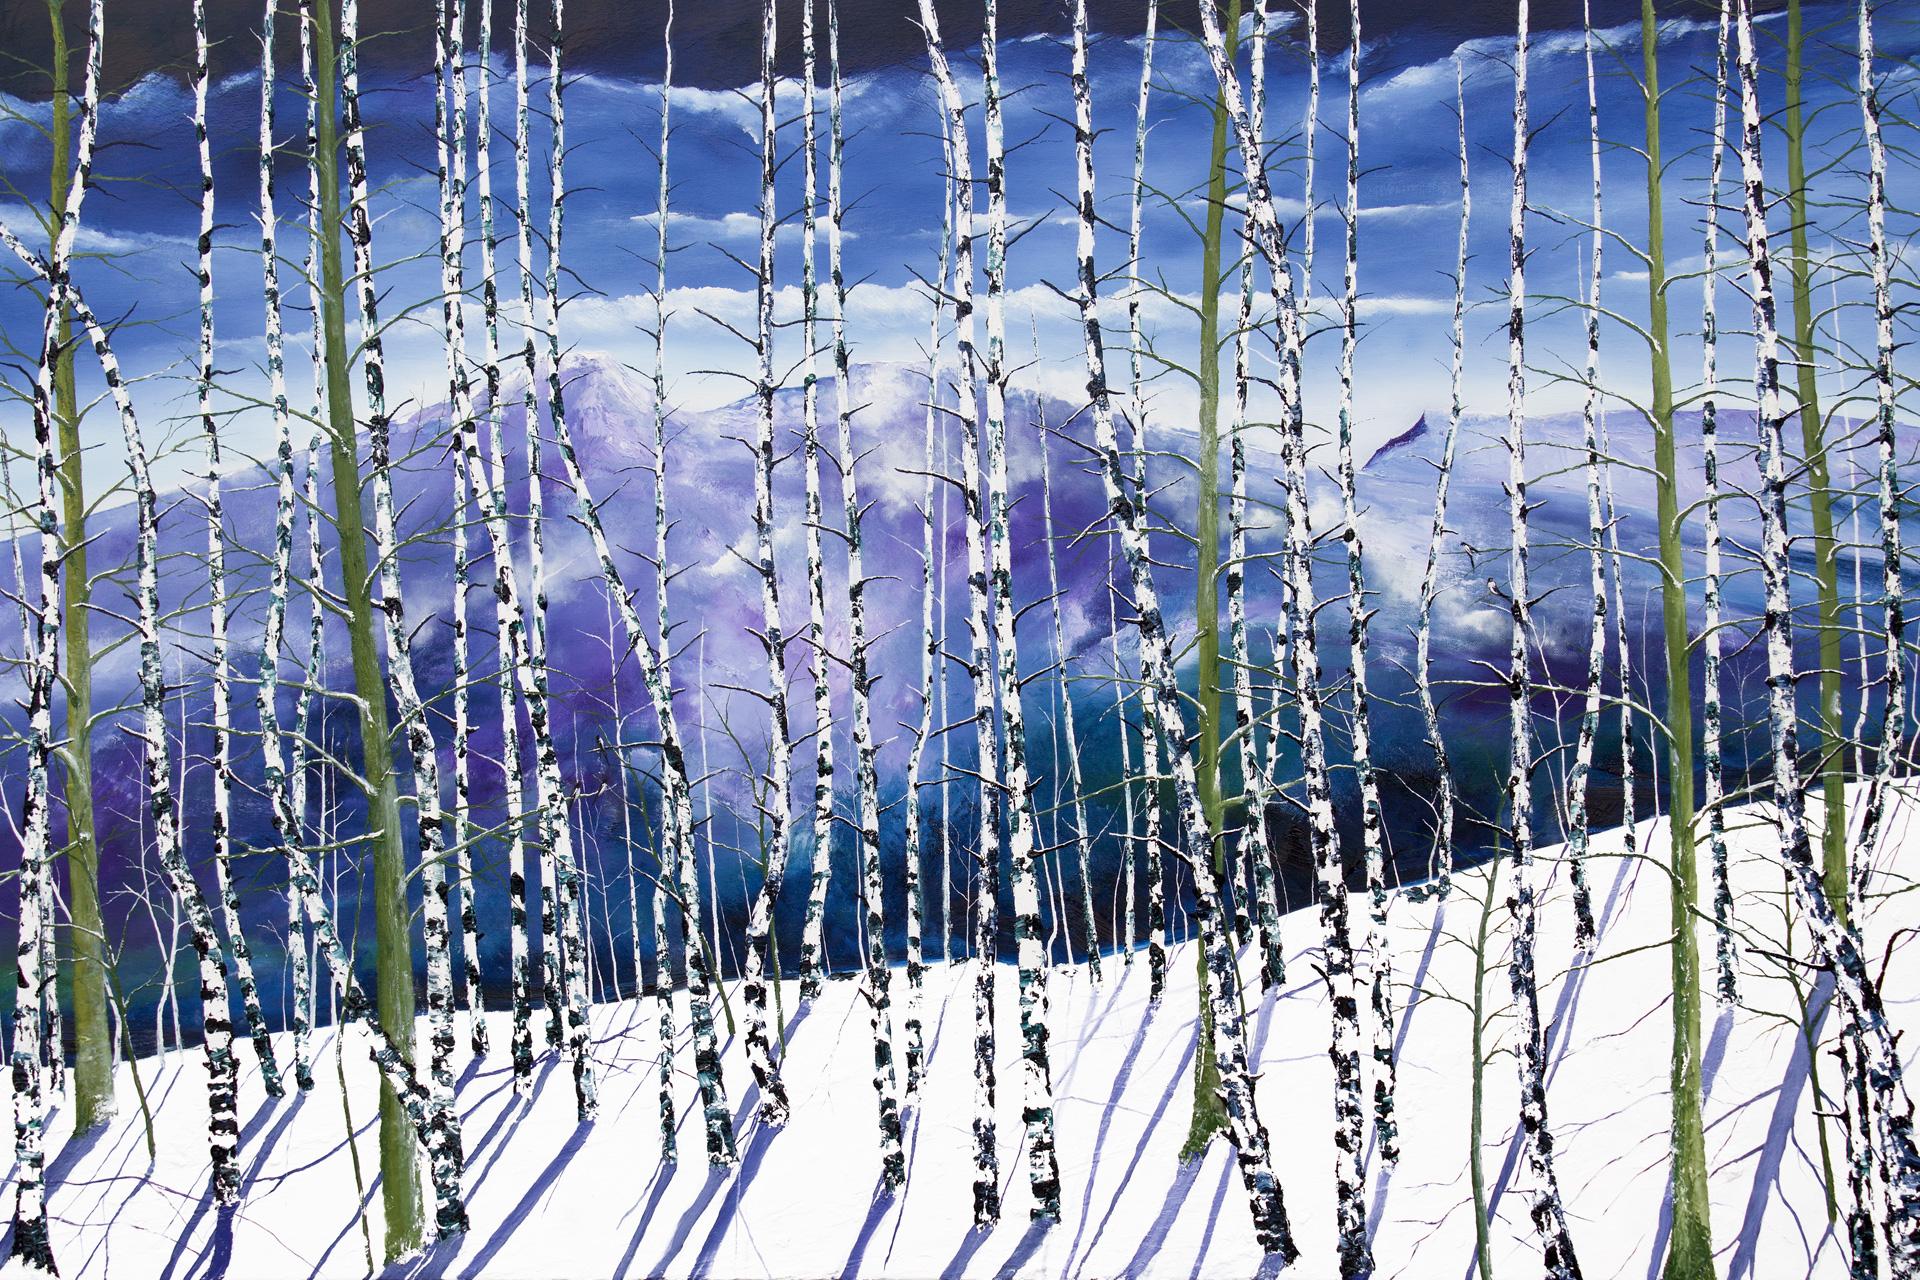 Winter Birches by David J Williams